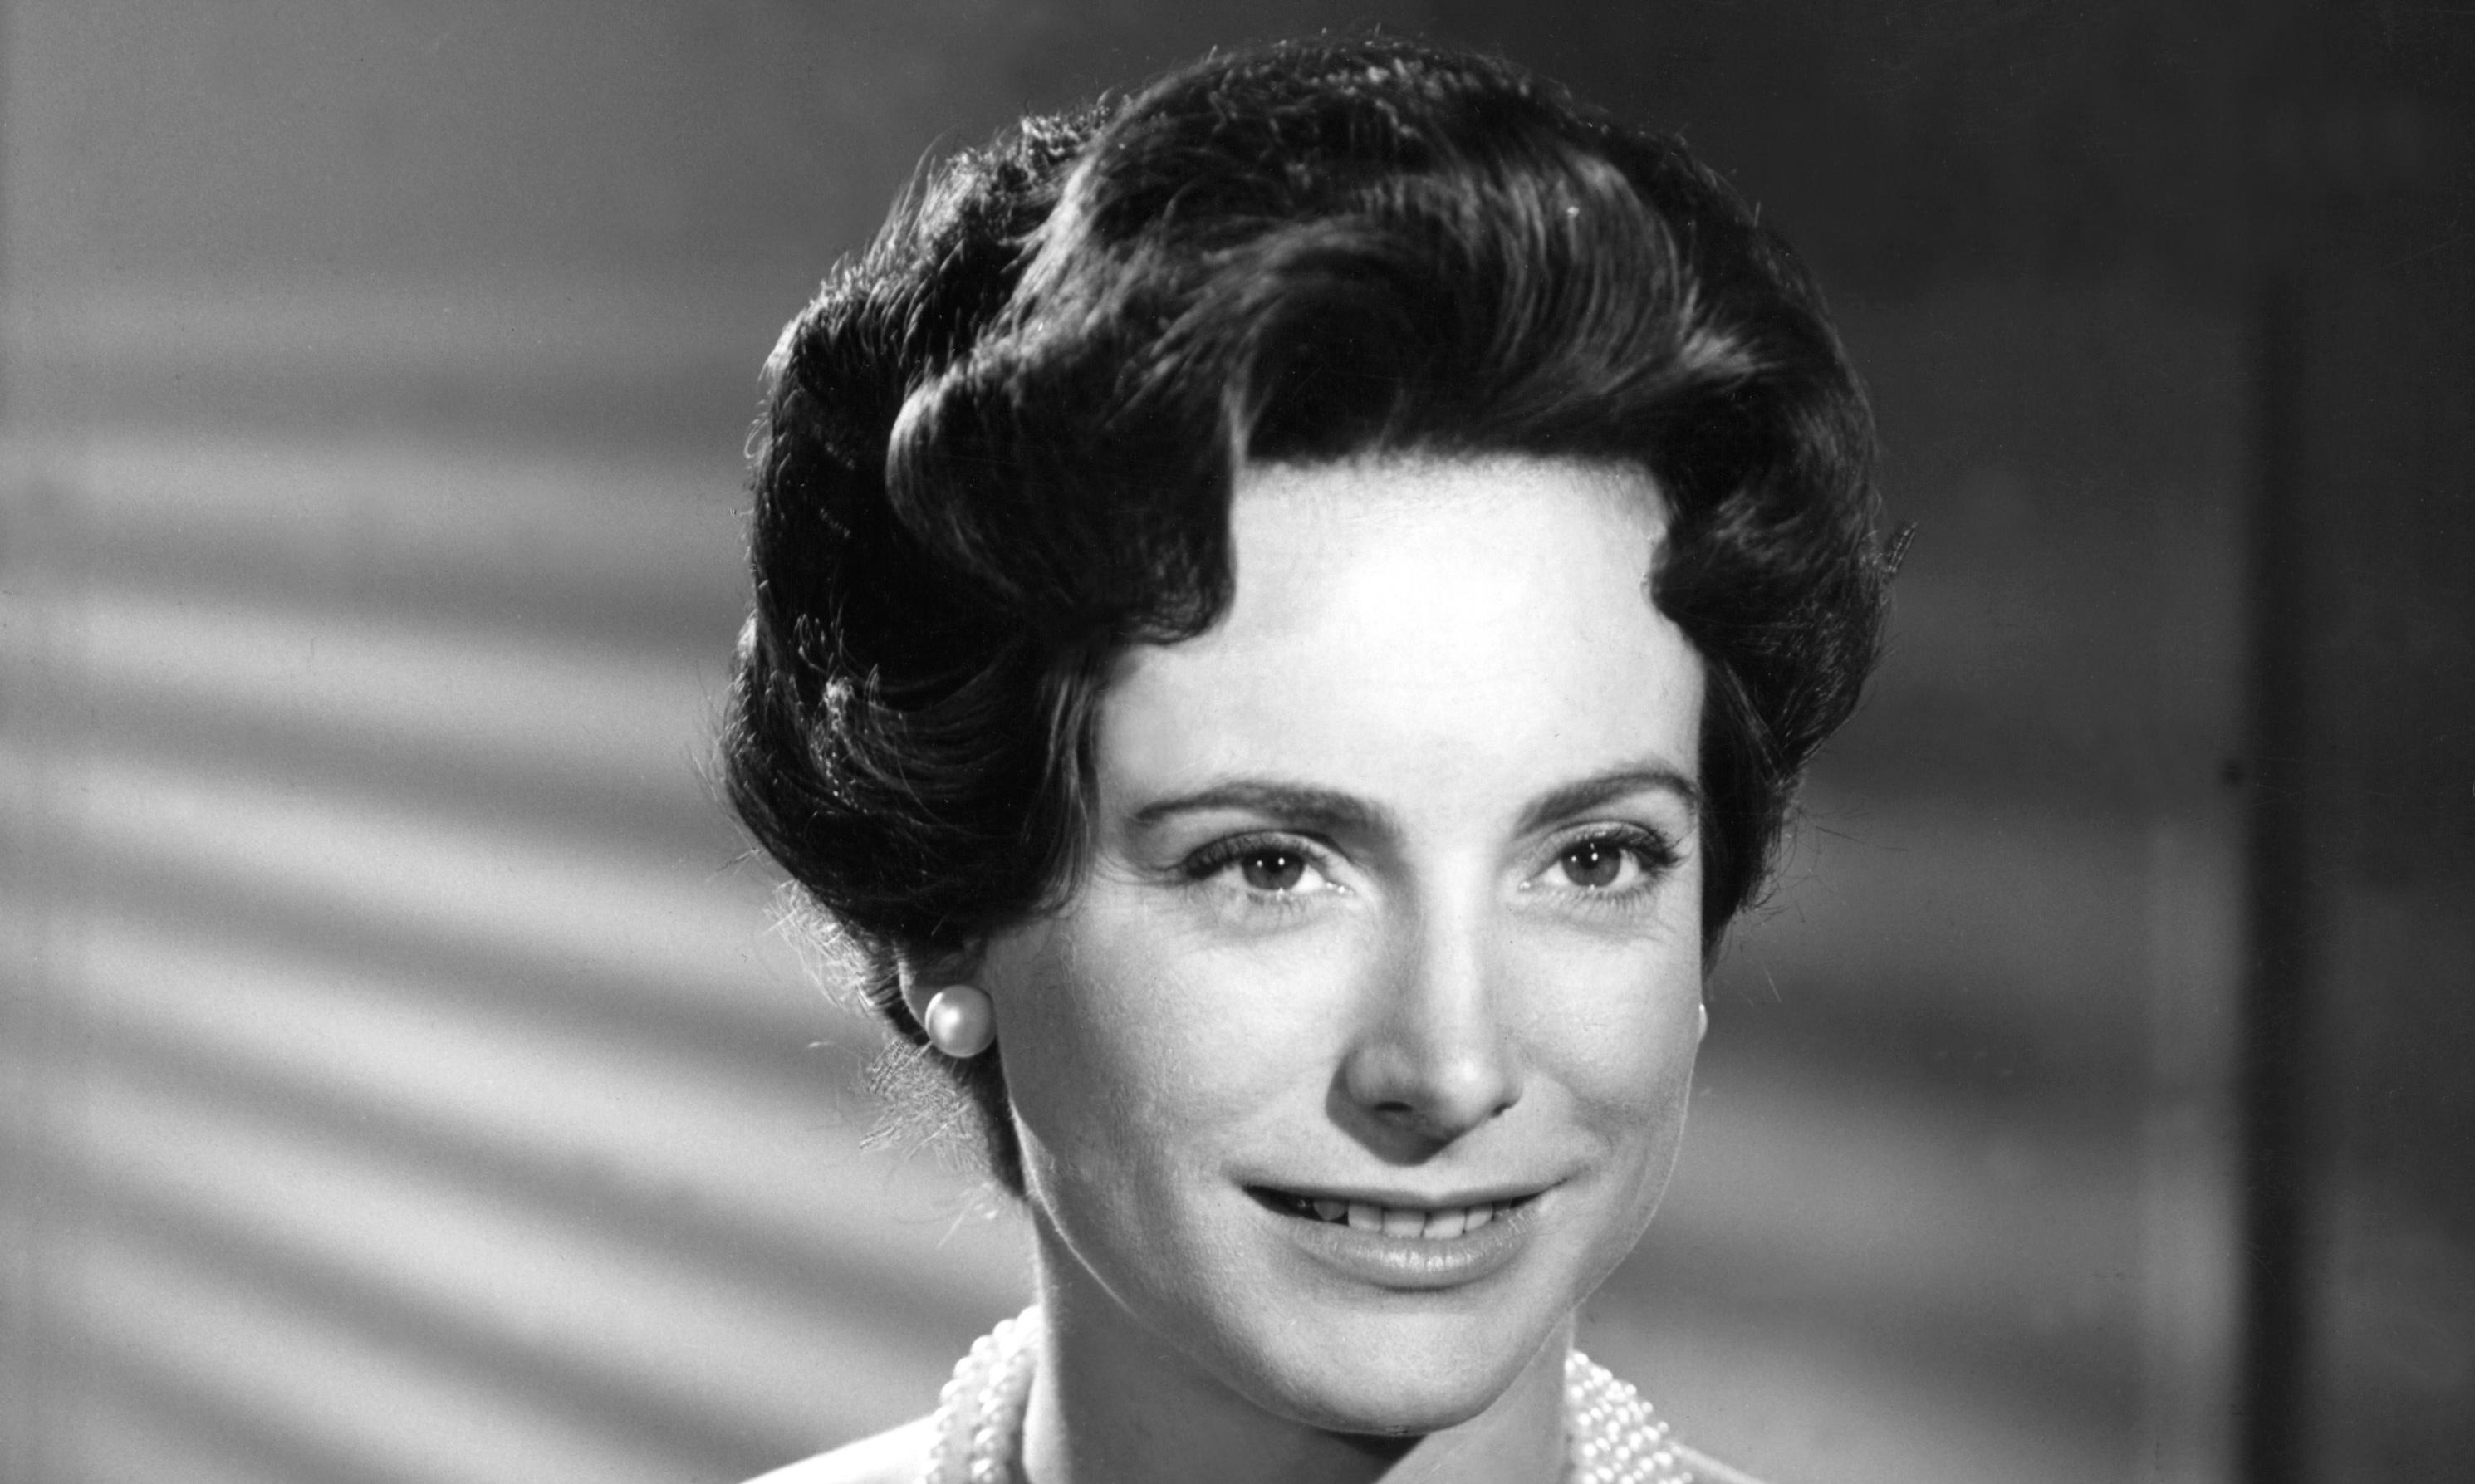 Nan Winton, BBC's first female TV newsreader, dies aged 93